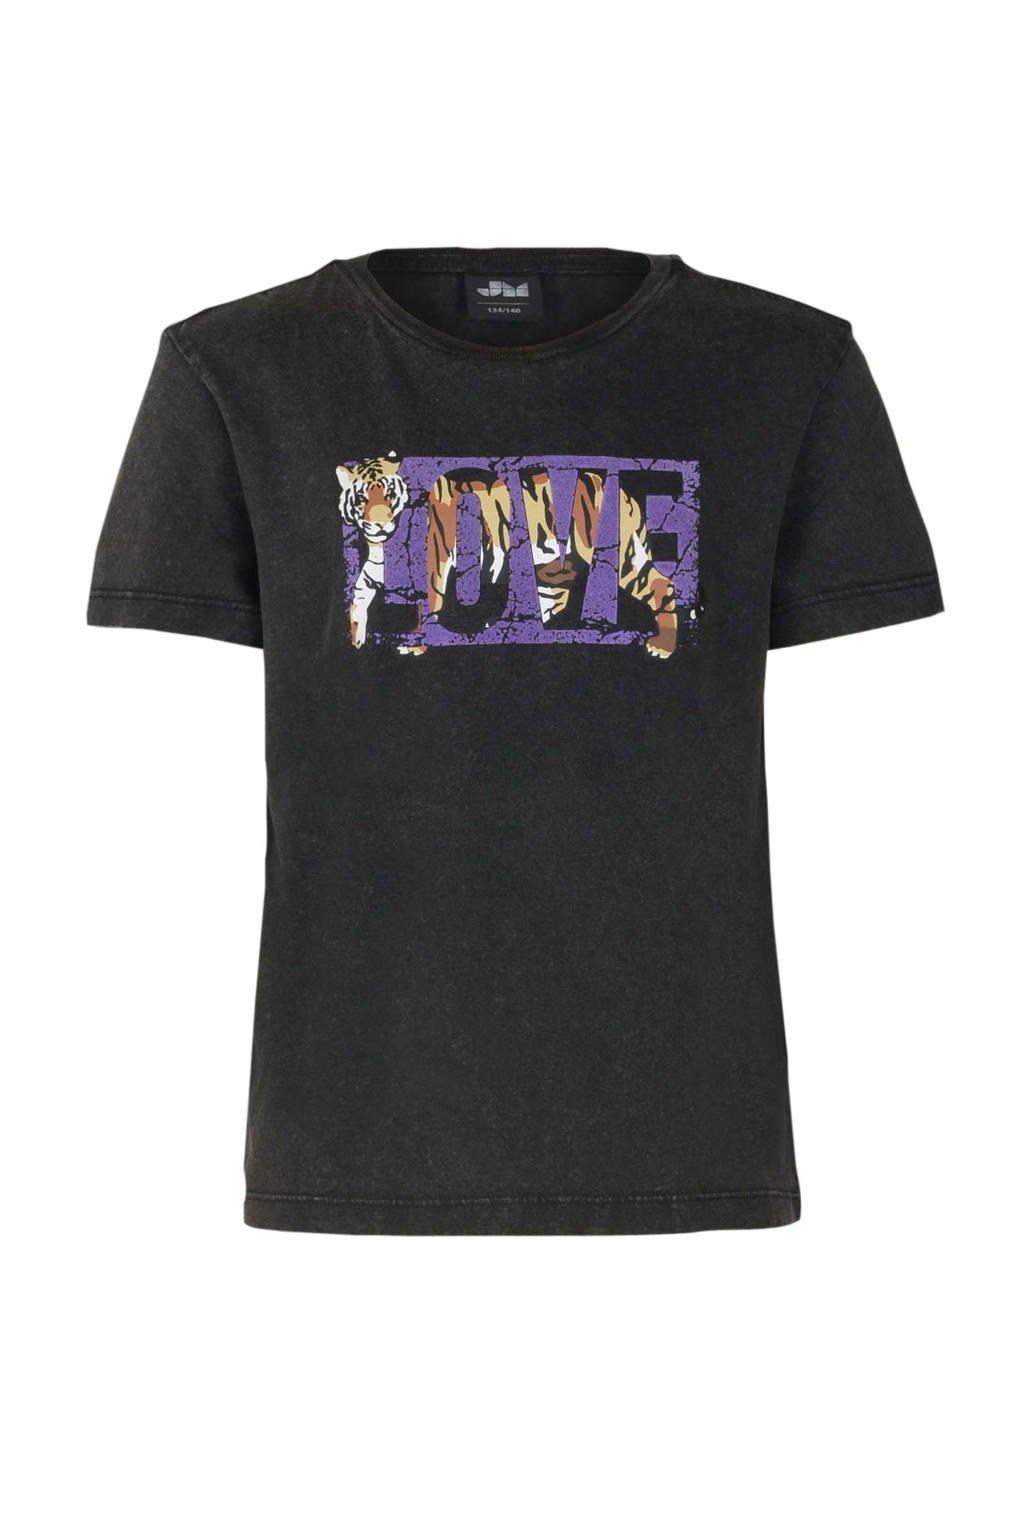 Jill & Mitch by Shoeby T-shirt Kato met printopdruk antraciet, Antraciet